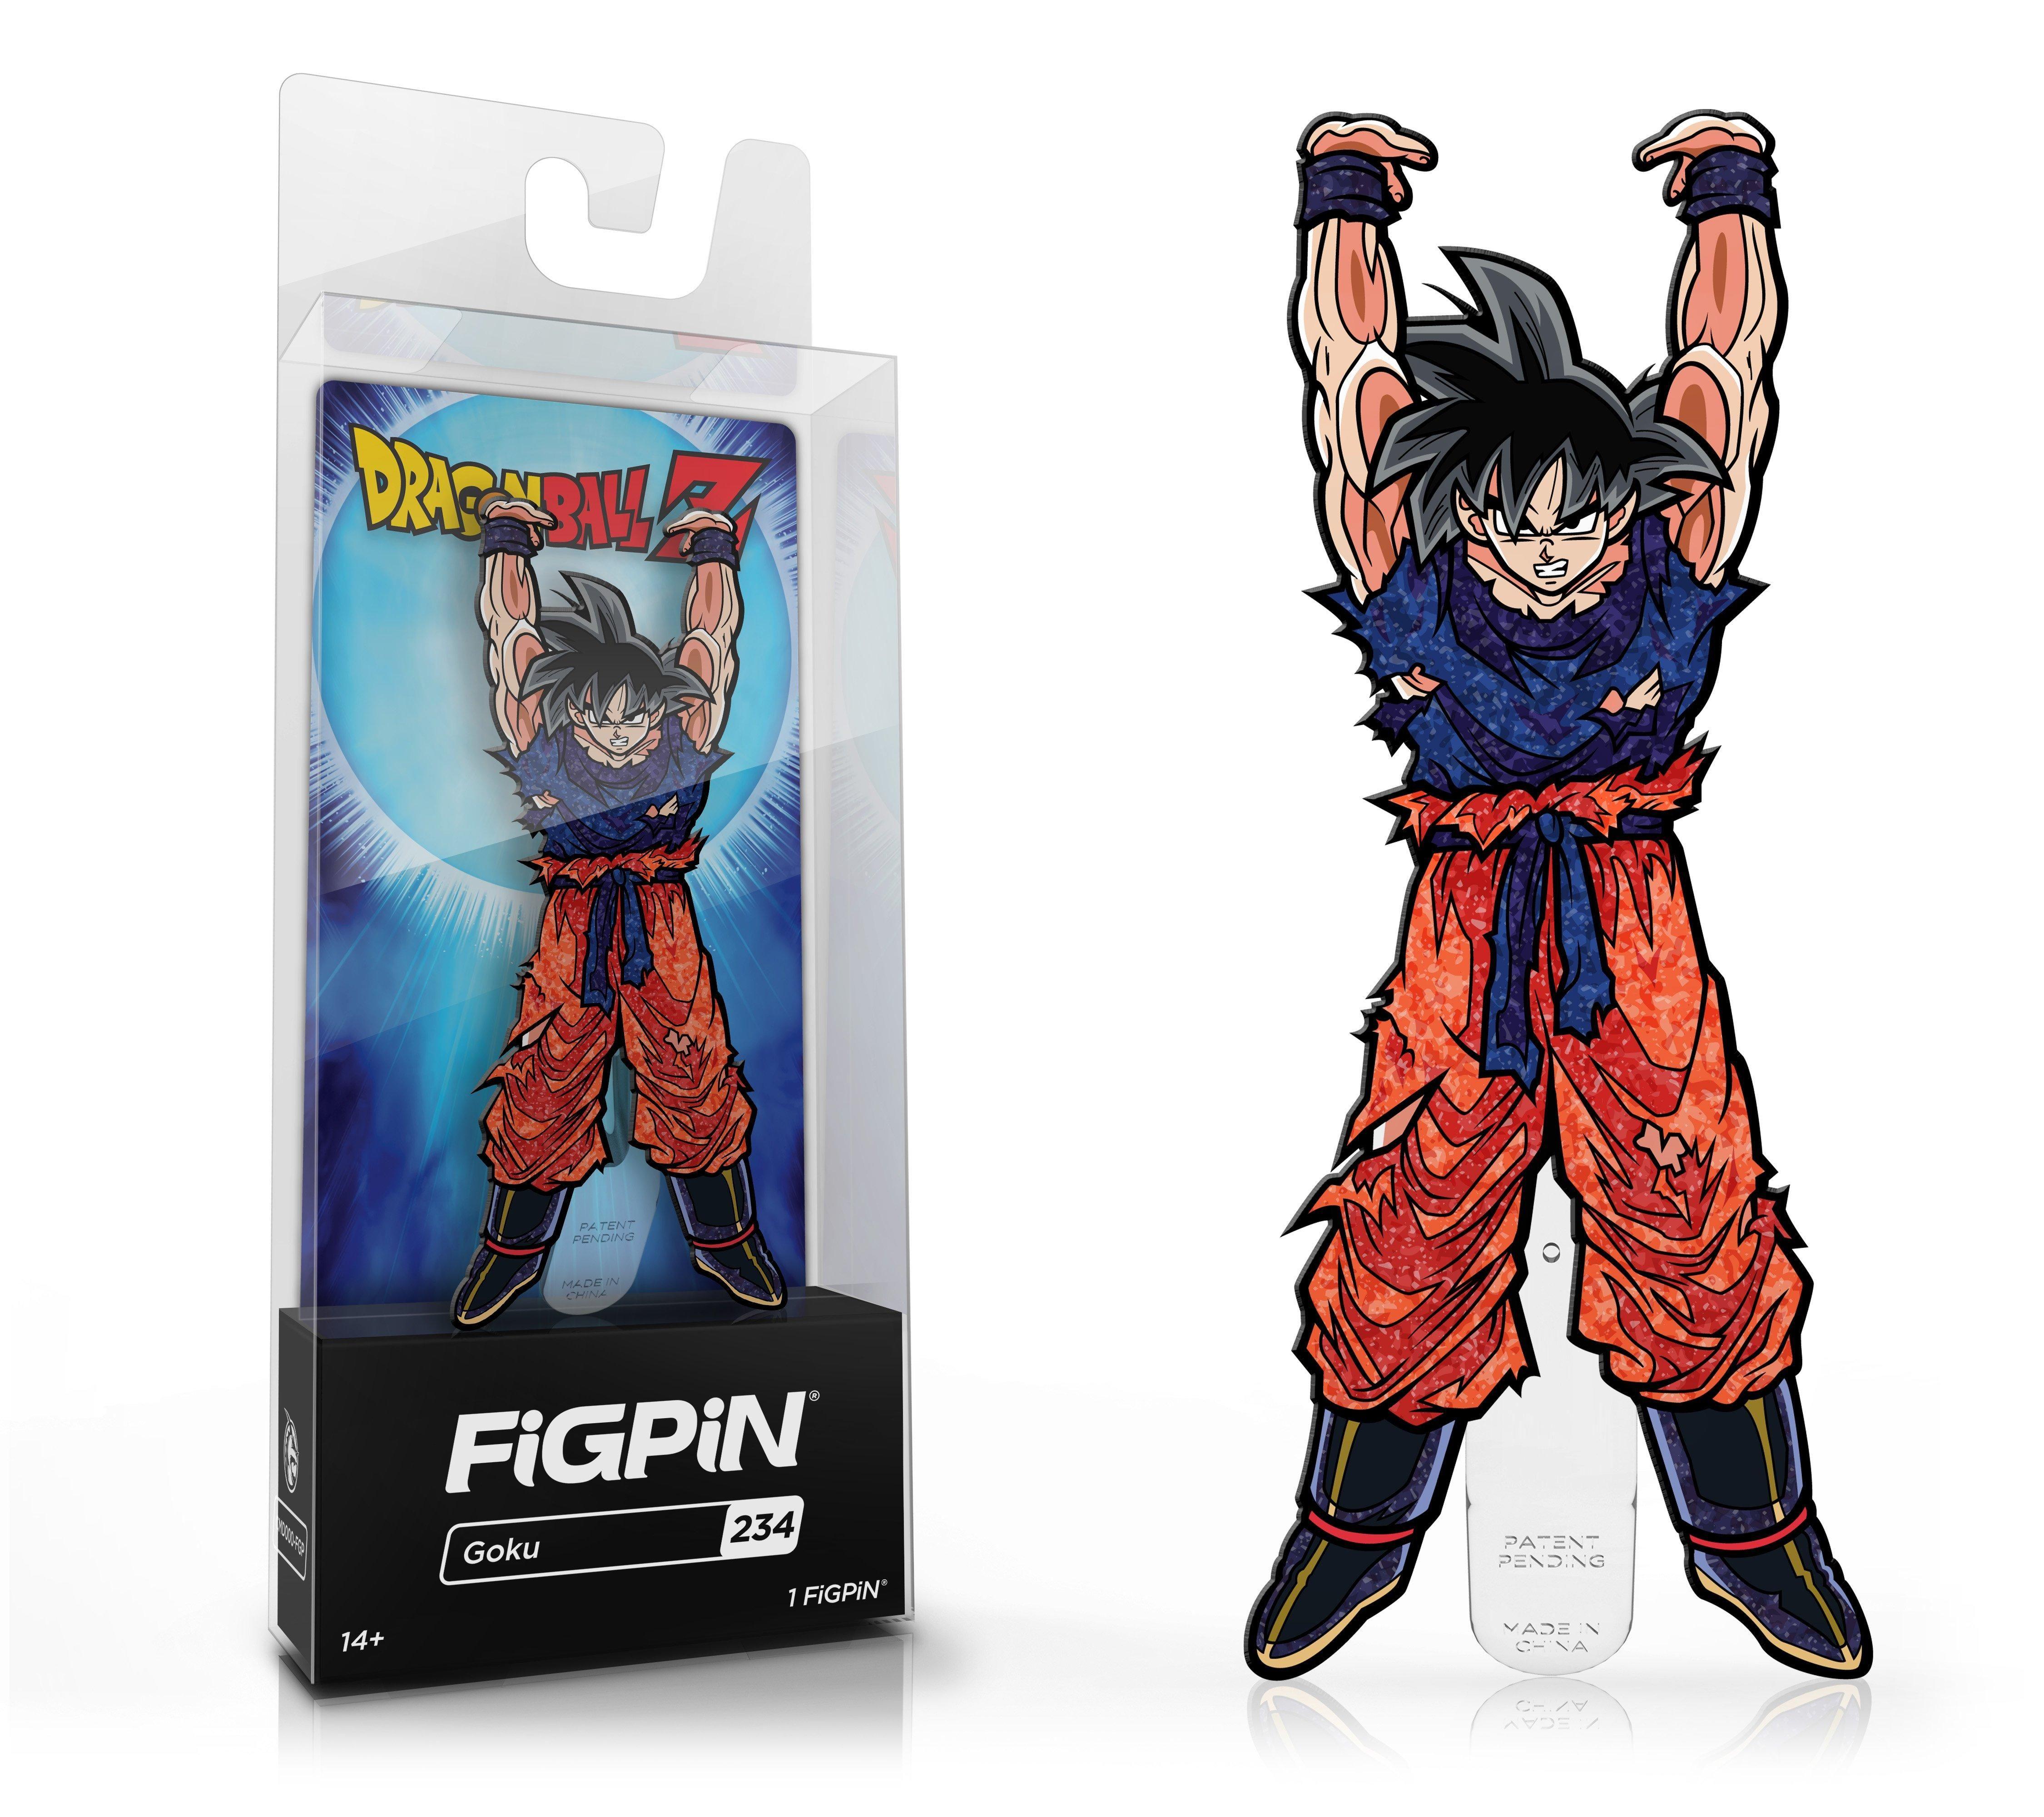 Dragon Ball Z: Kakarot Goku Glitter FiGPiN Only at GameStop | GameStop